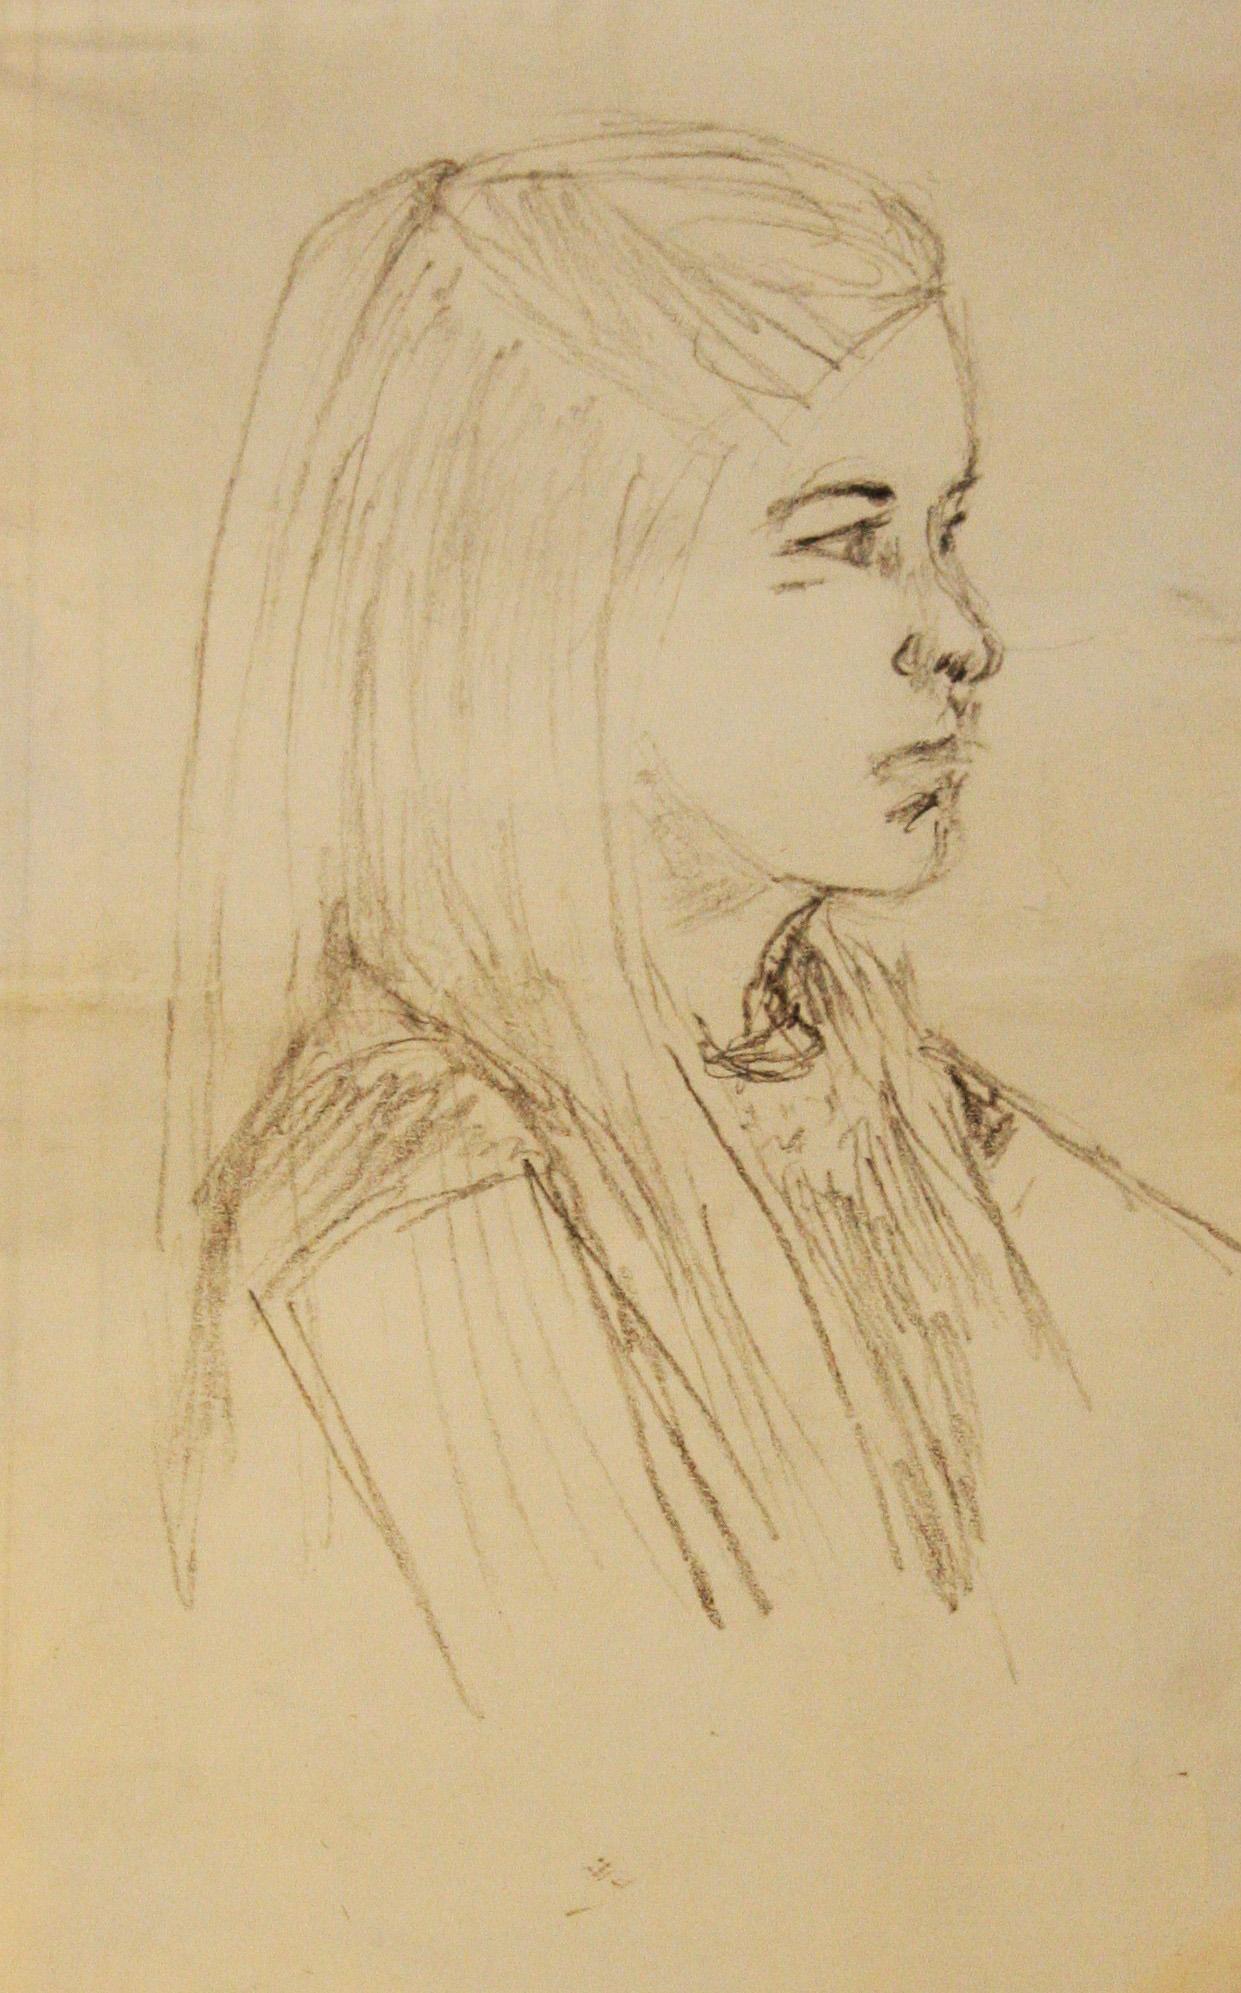 Sarah Morrison did this drawing of her daughter Bella.